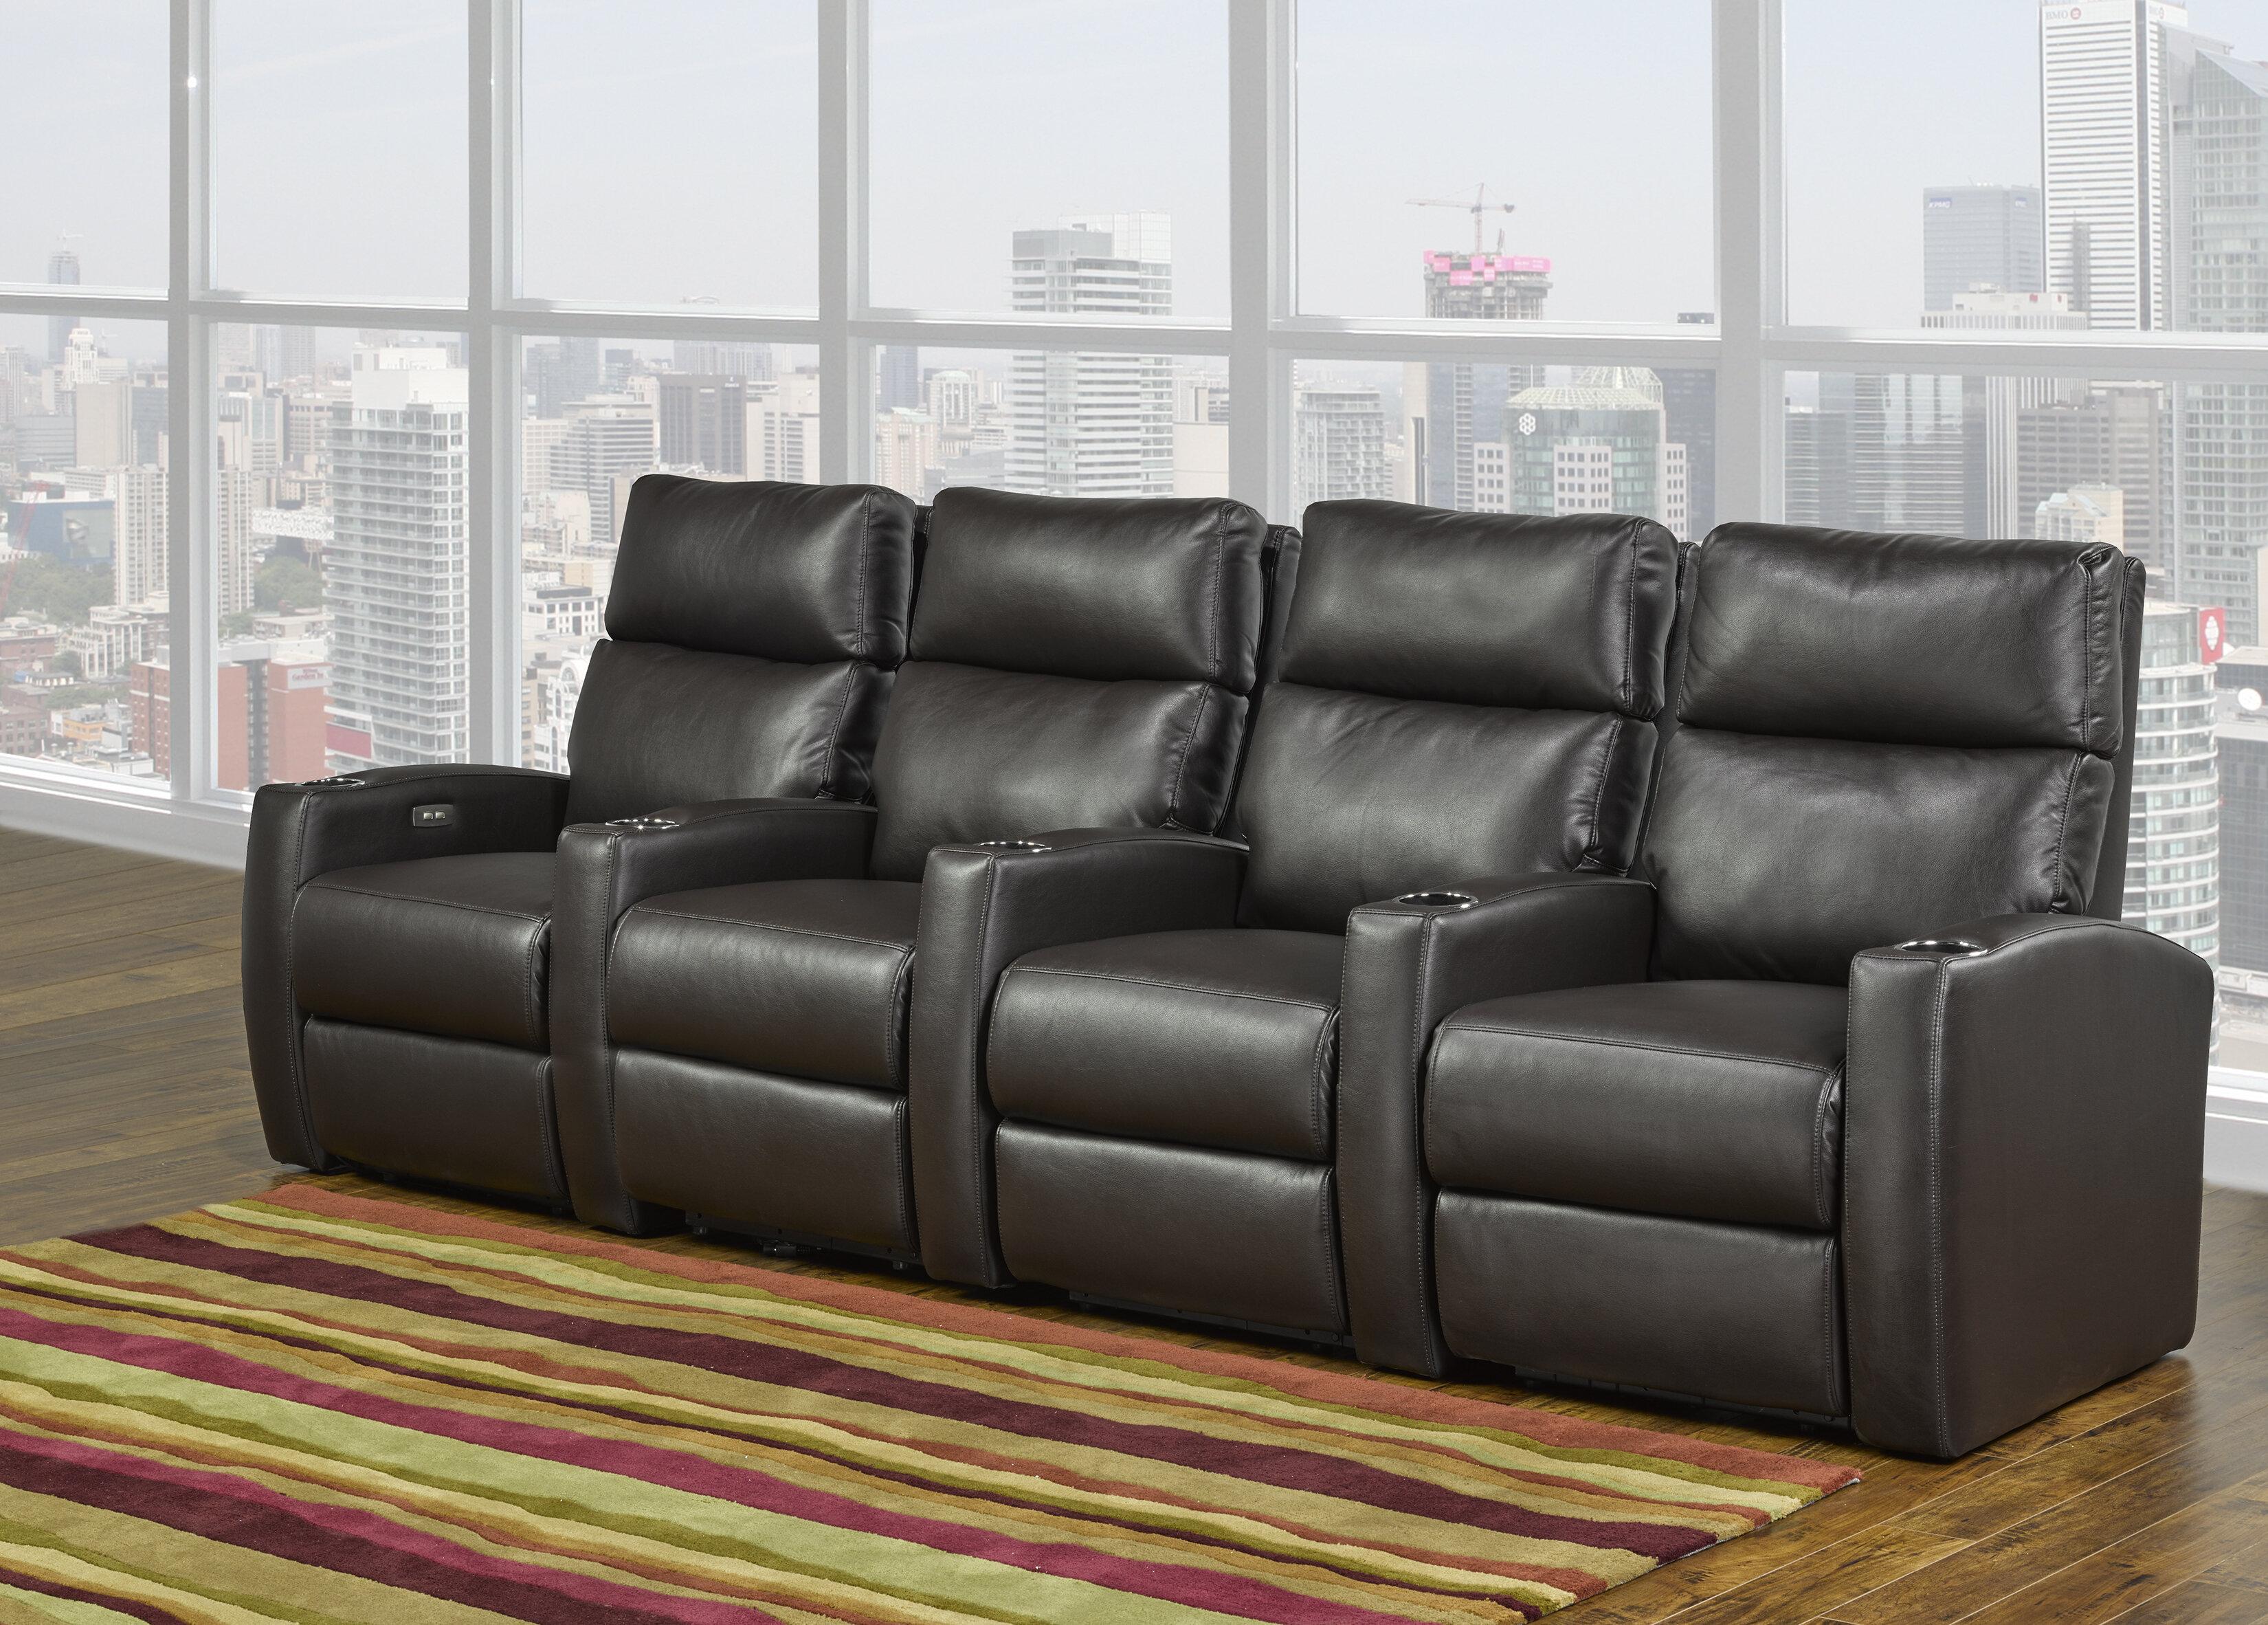 Swell Home Theater Sofa Row Of 4 Creativecarmelina Interior Chair Design Creativecarmelinacom